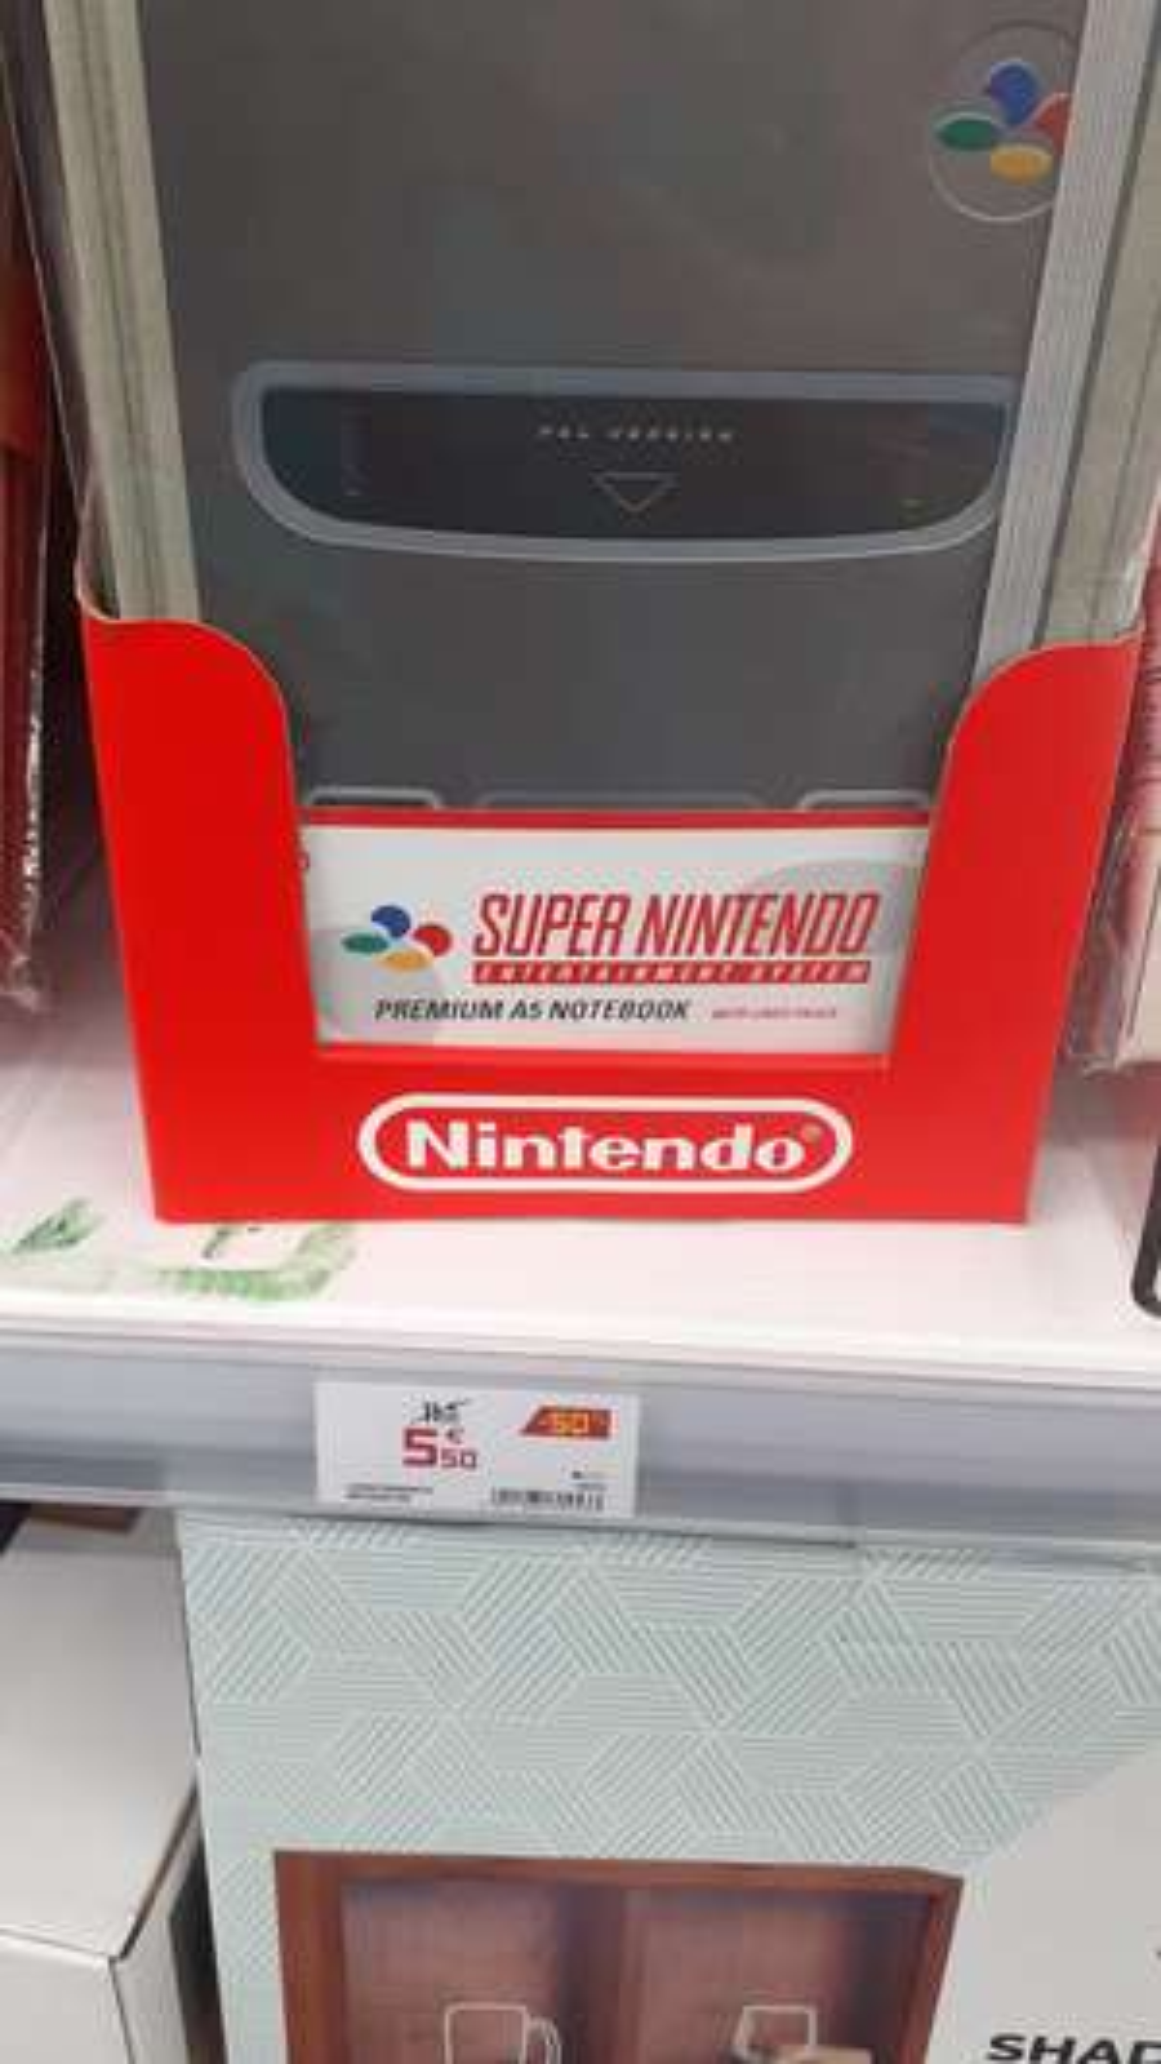 Cahier de note Super Nintendo - GiFi Bouliac (33)